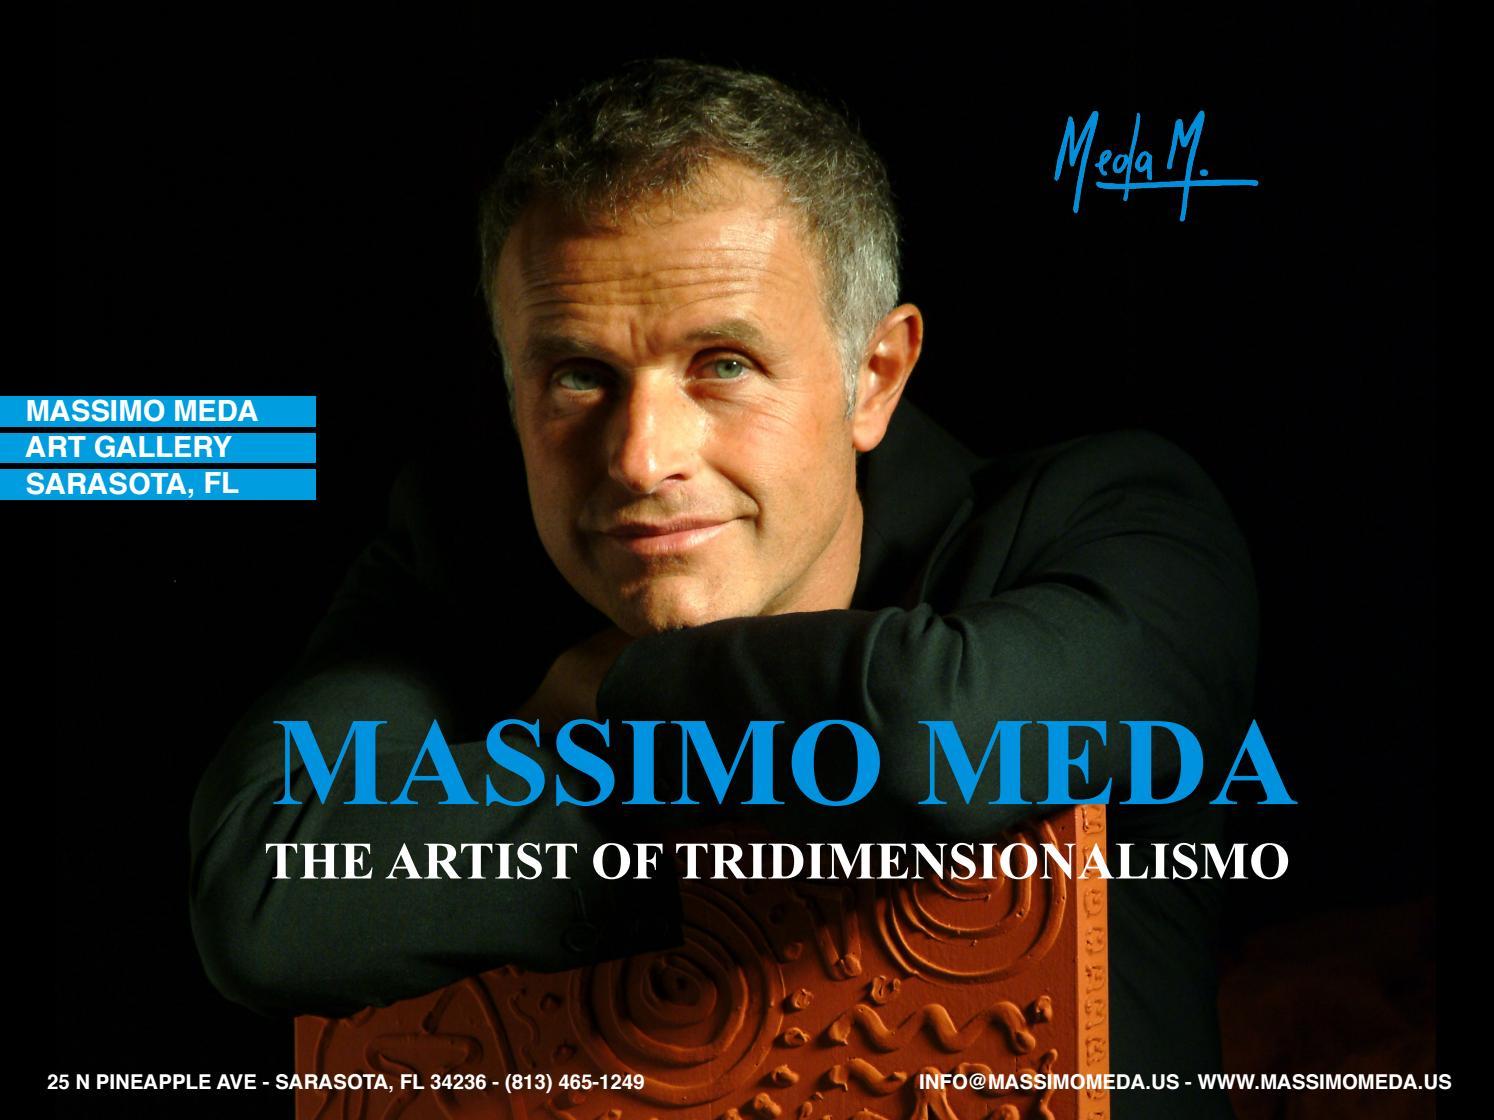 Massimo Meda Art Gallery Sarasota by Massimo Meda Art Gallery ...